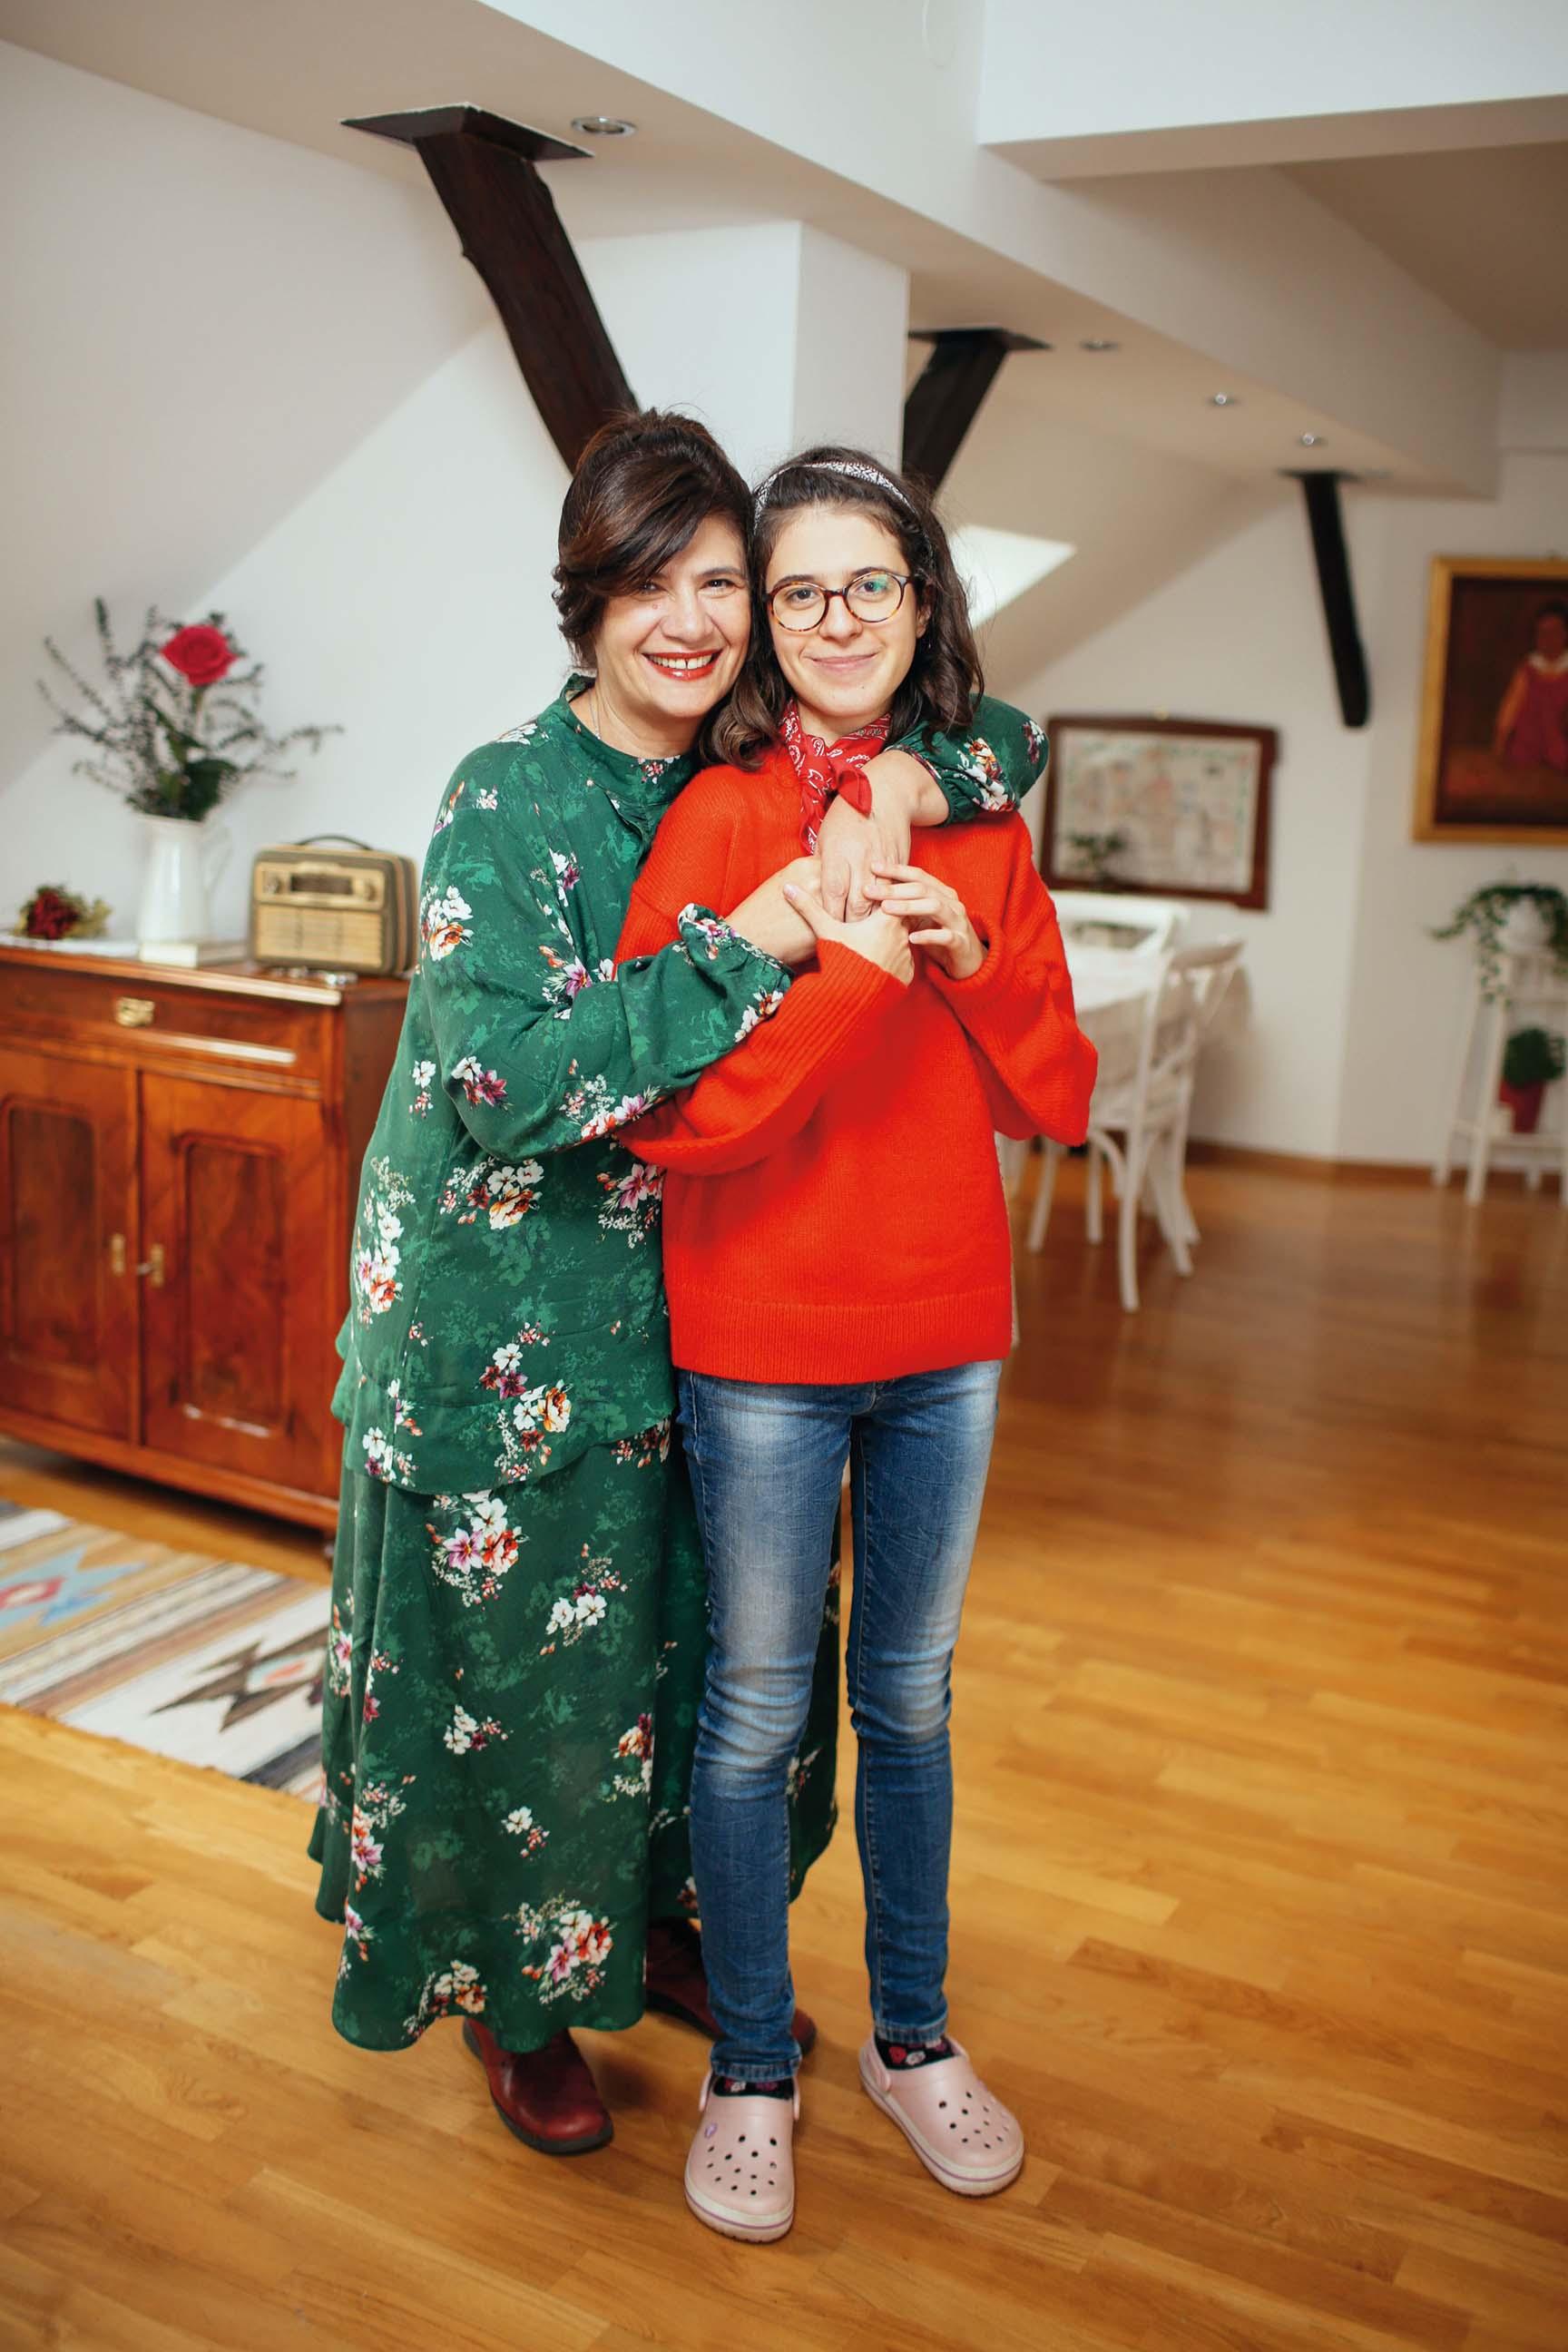 Osijek 25.11.2017 Julijana Matanovic, Pavao Pavlicic i Magdalena Zivkovic foto vedran peteh